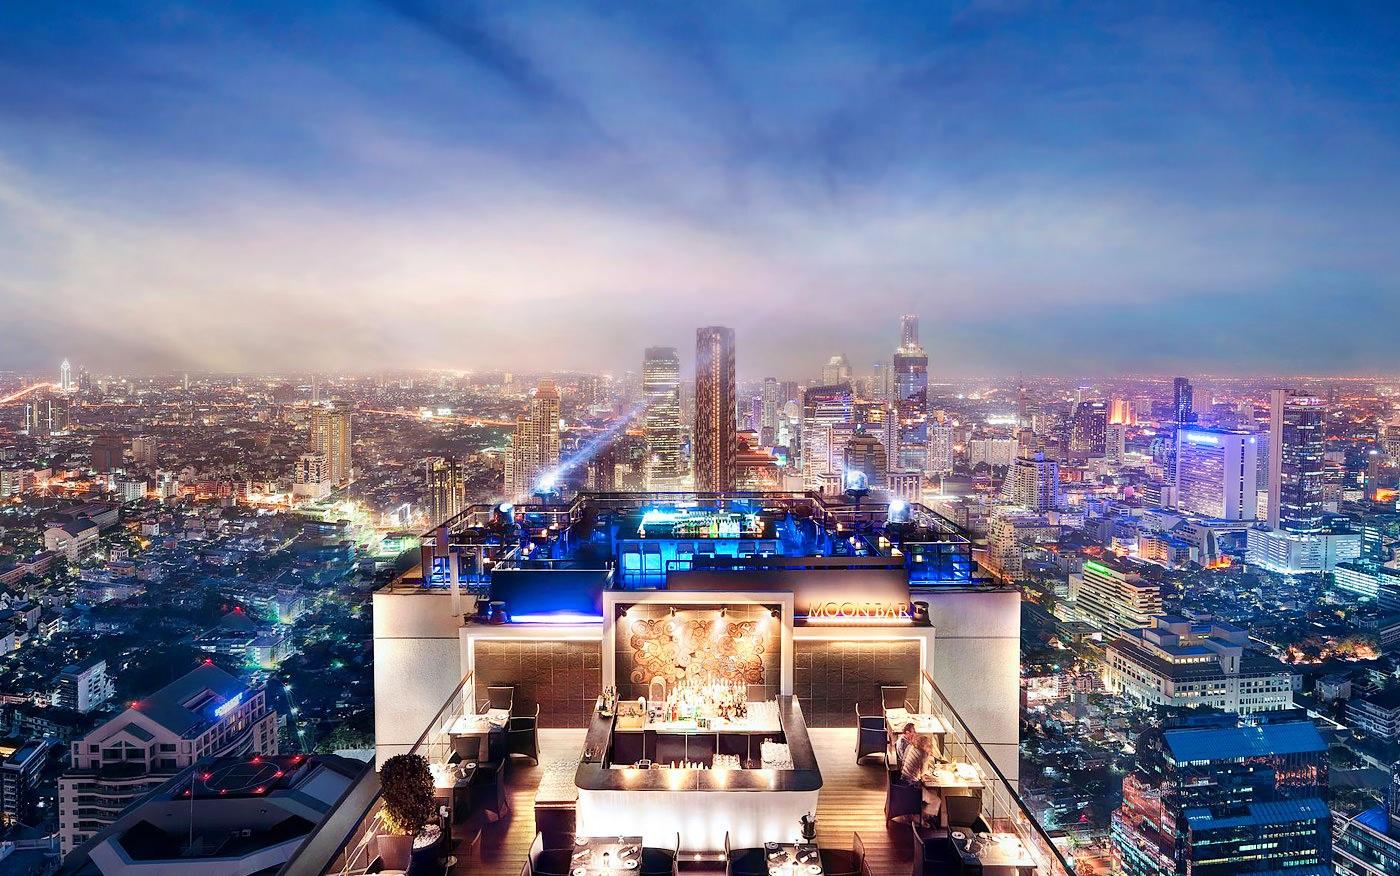 11. Vertigo Grill & Moon Bar at Banyan Tree || Bangkok, Thailand